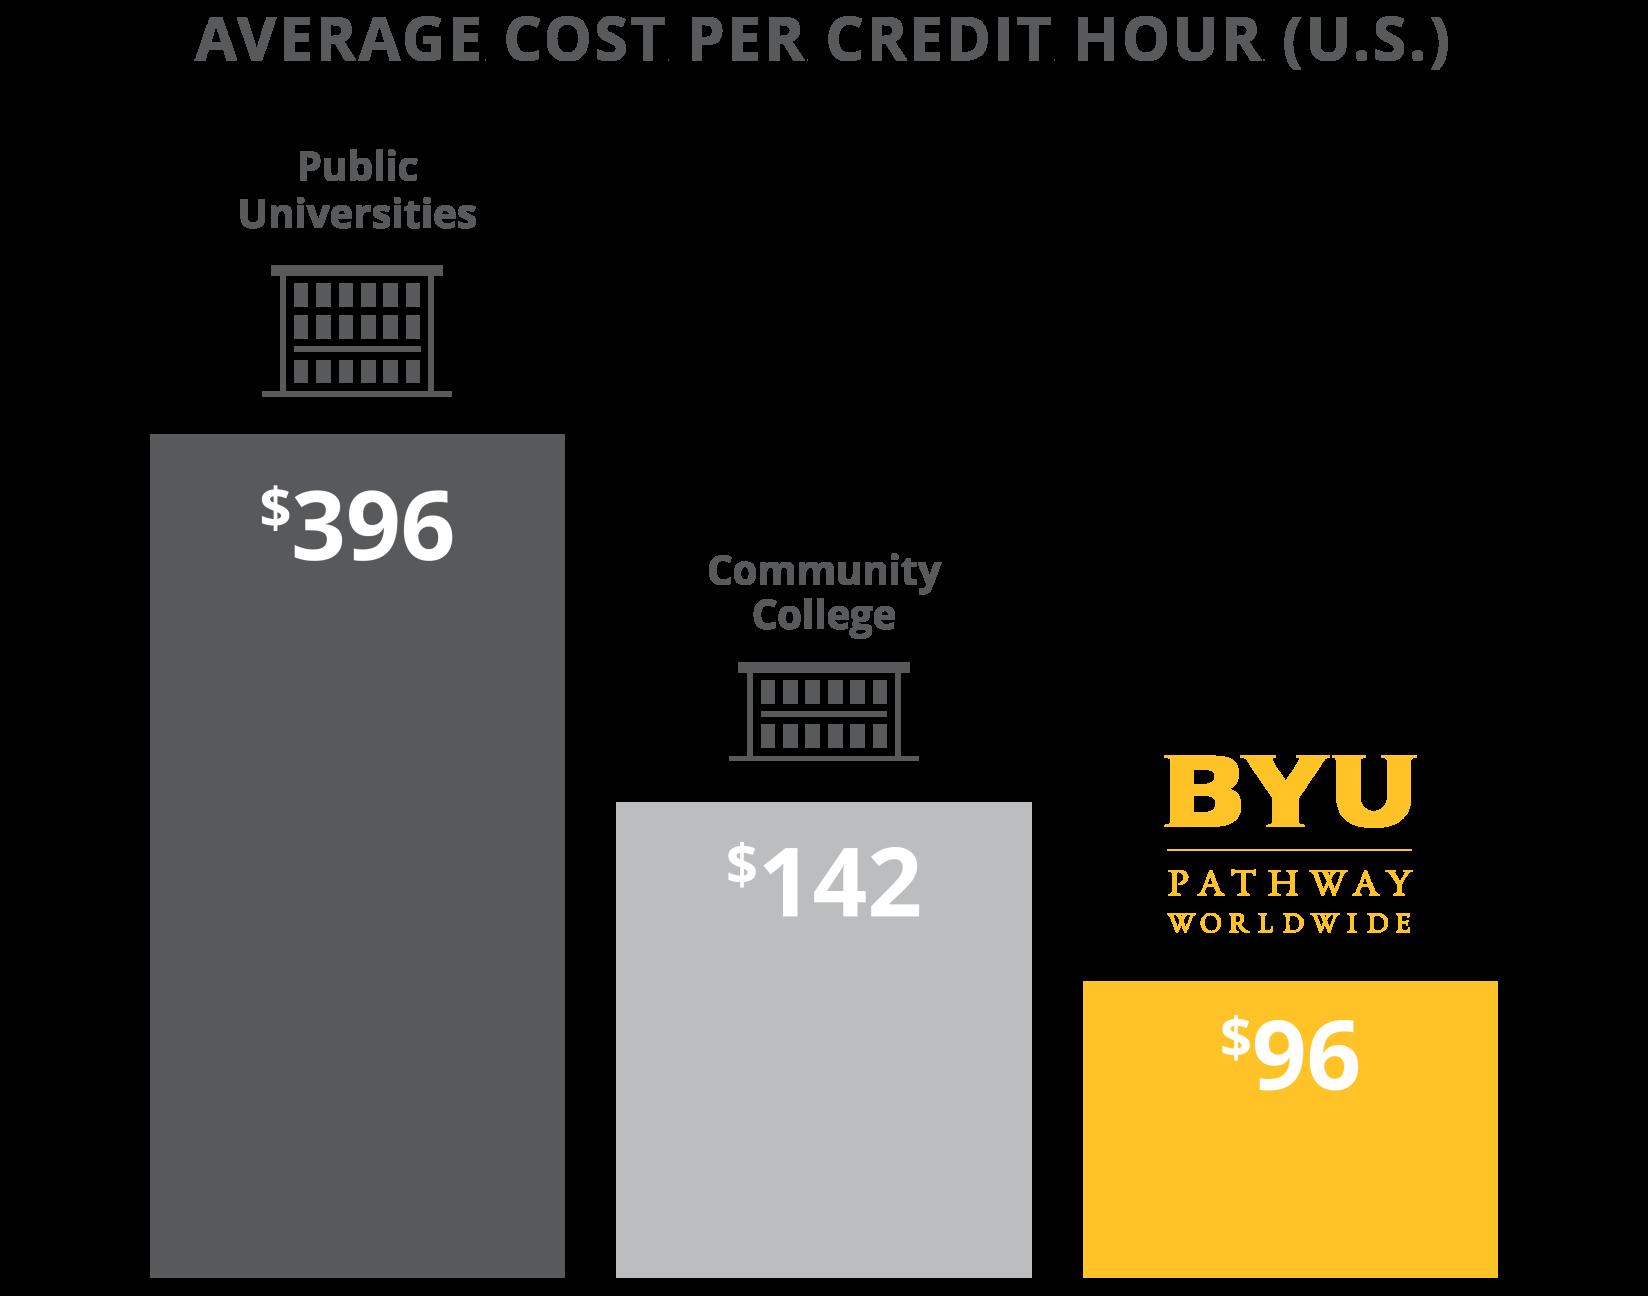 Average Cost Per Credit Hour (U.S.)